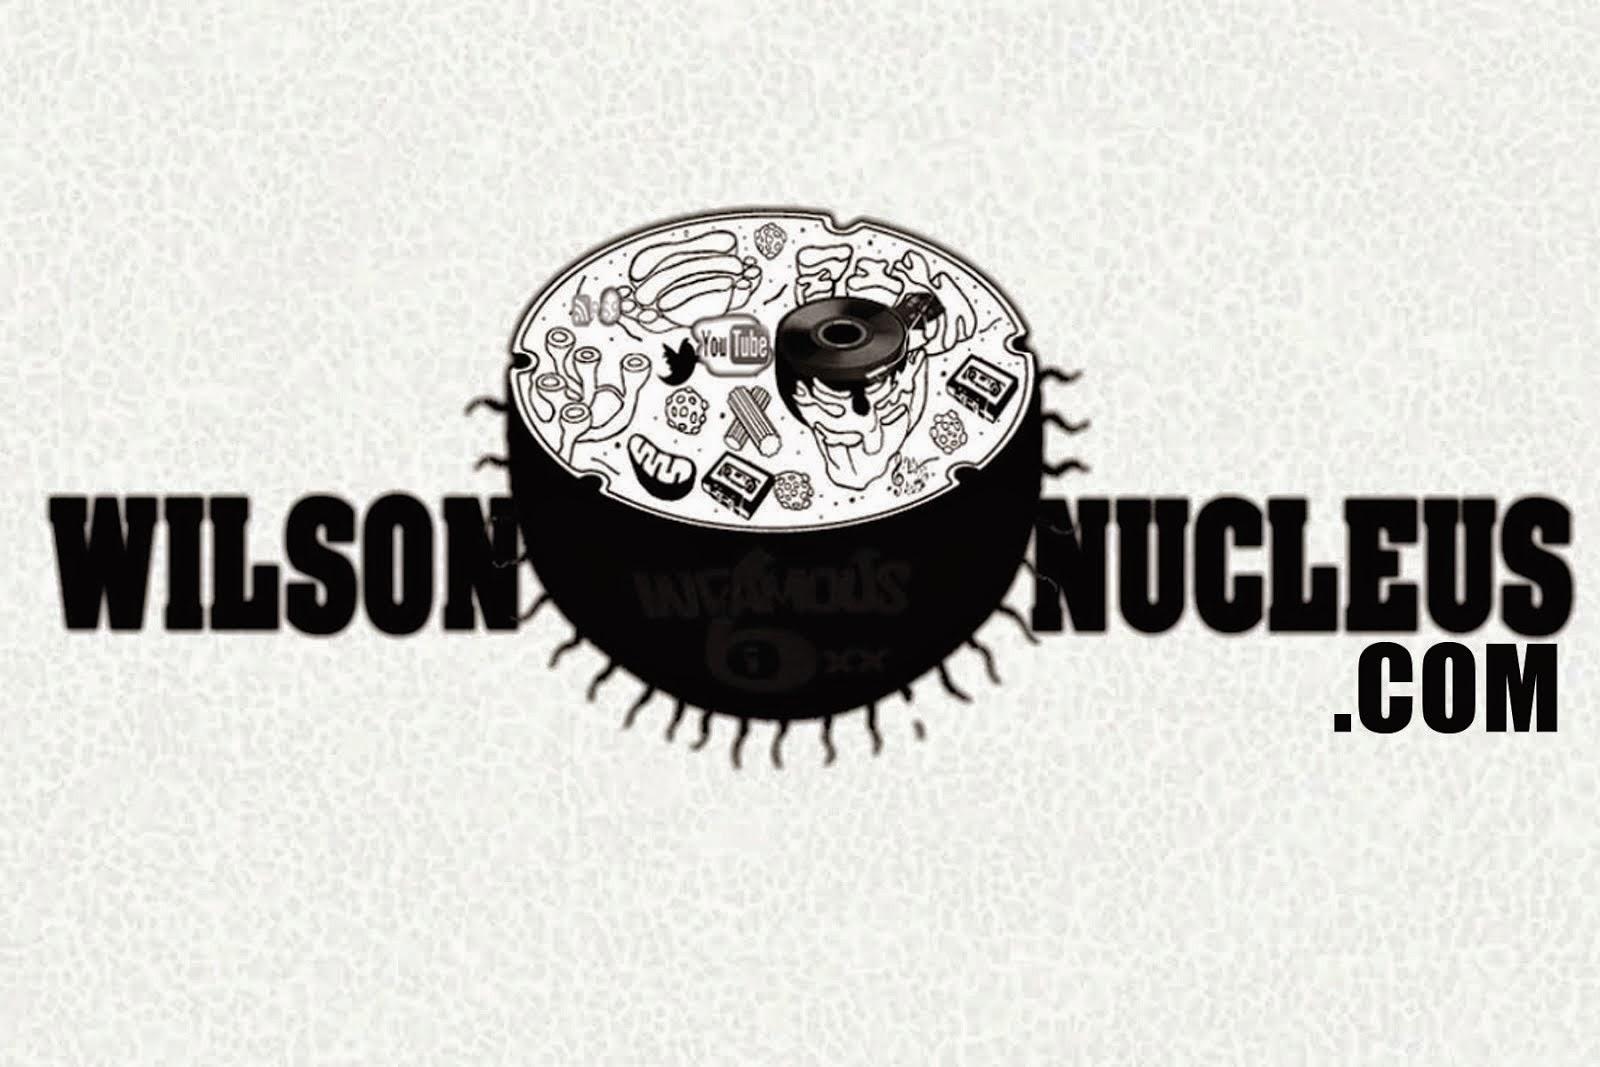 WilsonNucleus.Com